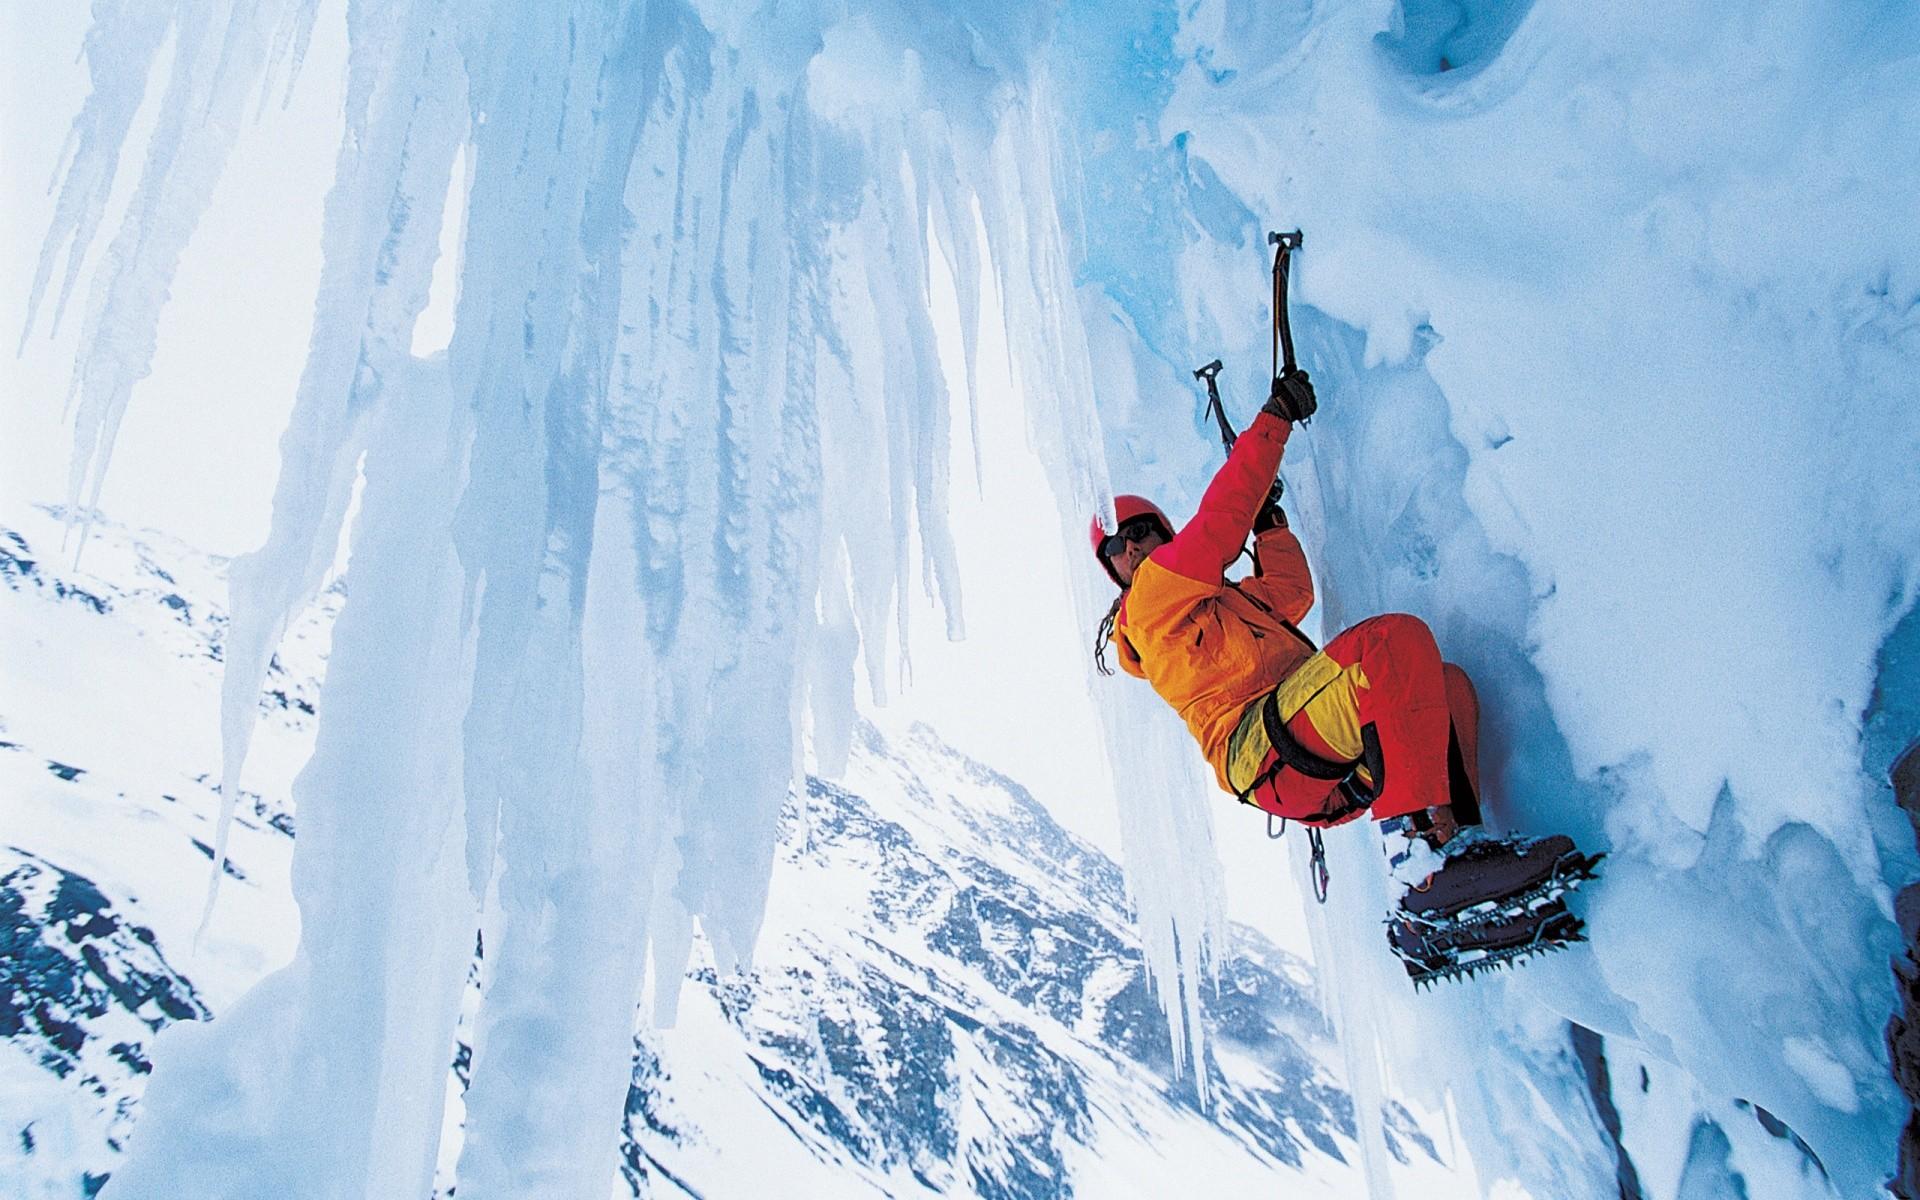 diablo 3 how to get ice climbers